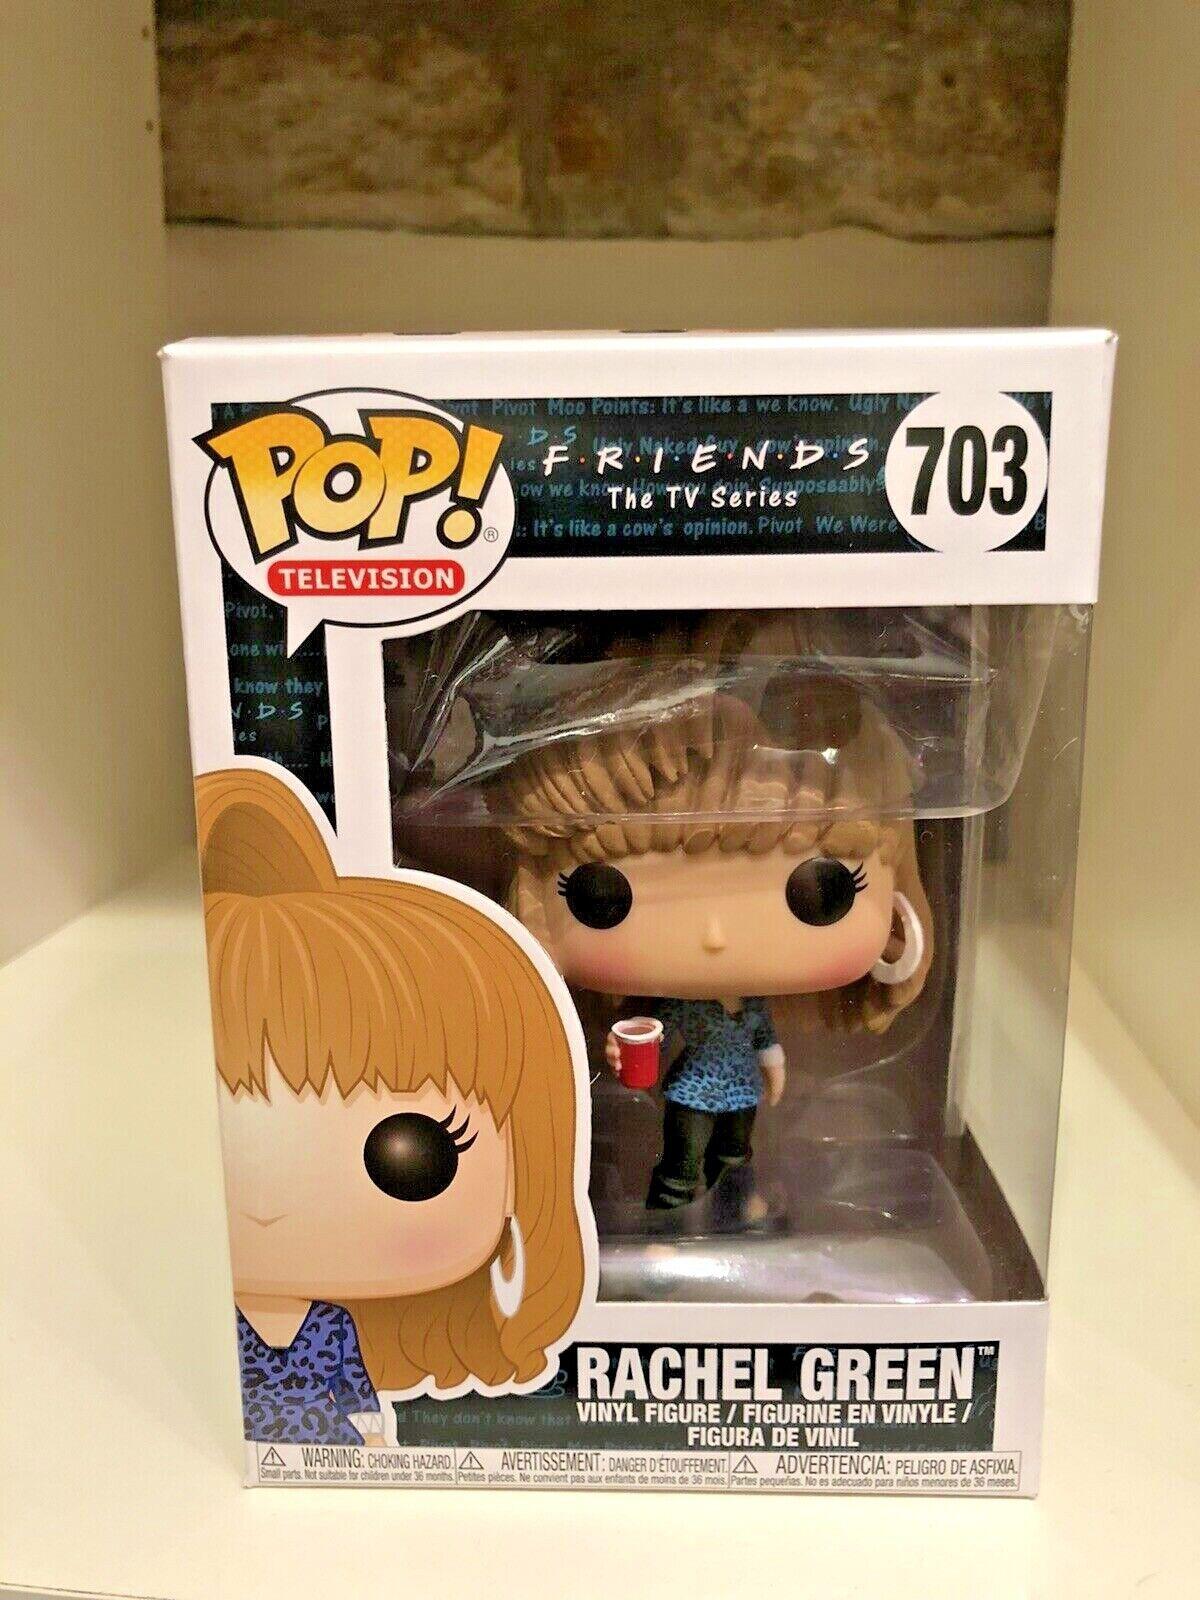 RACHEL GREEN 80s HAIR FUNKO POP FRIENDS TV SERIES FLASHBACK JENNIFER ANISTON 703